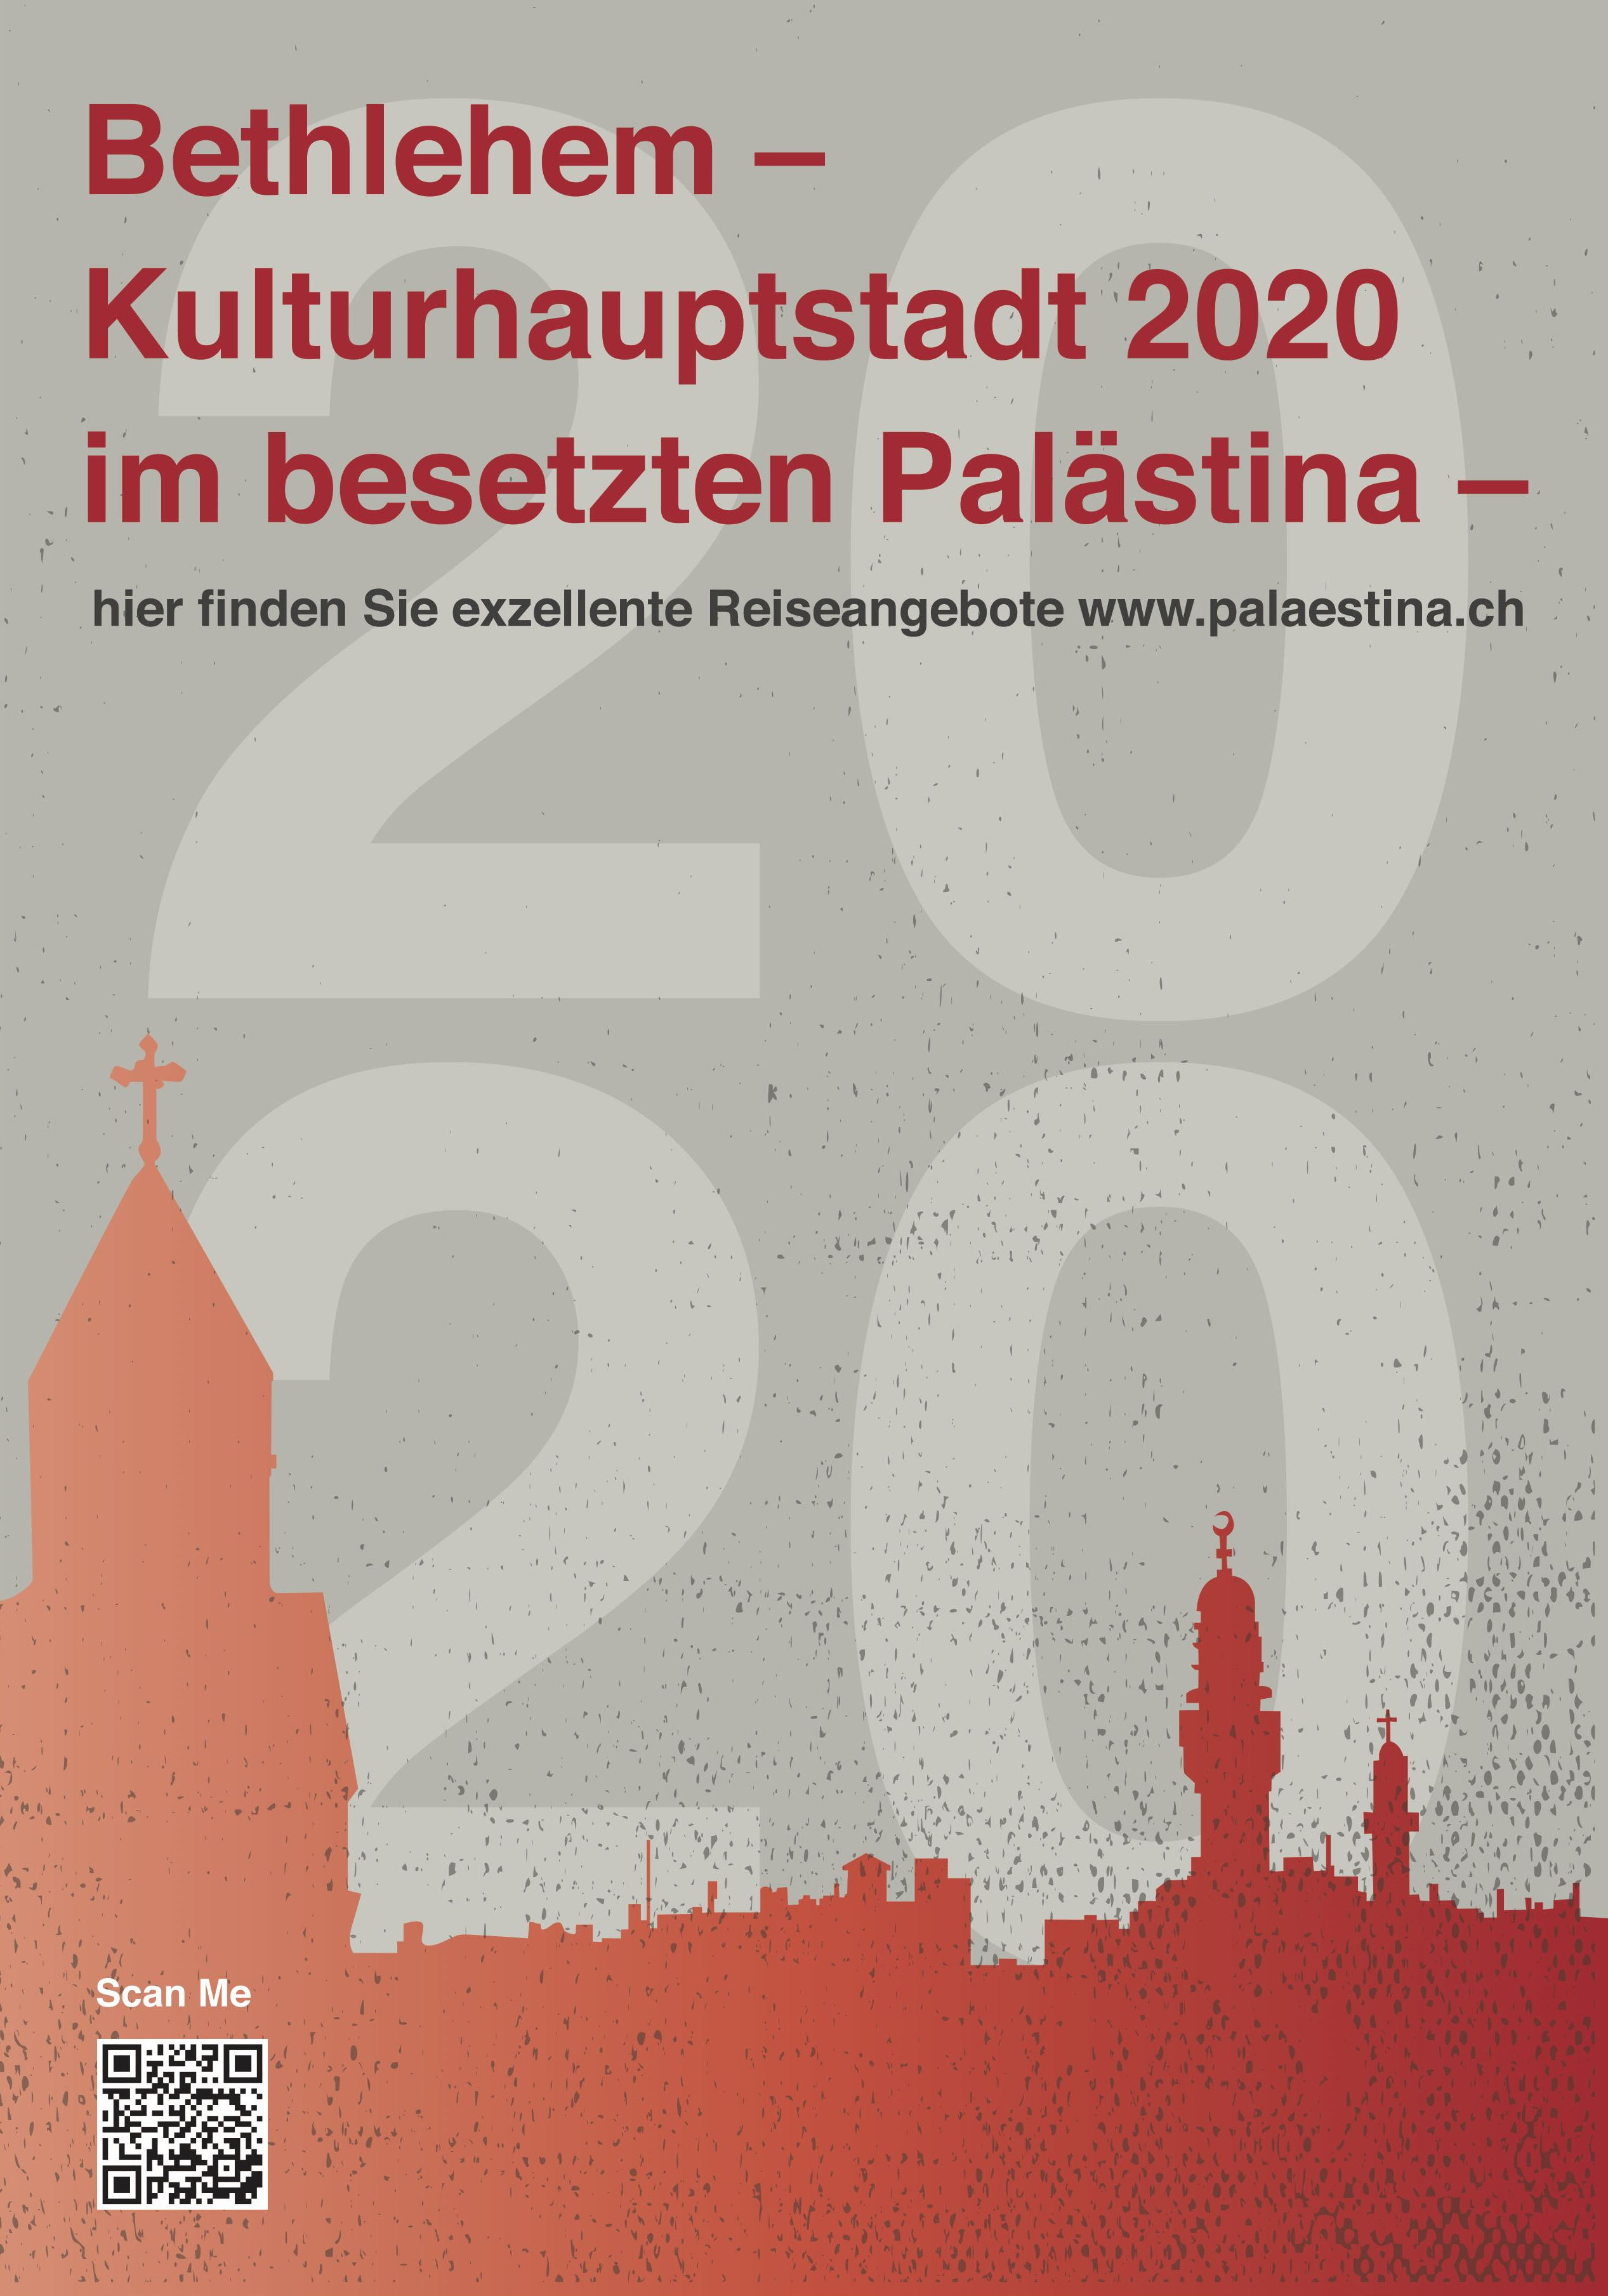 Bethlehem 2020 Plakat de